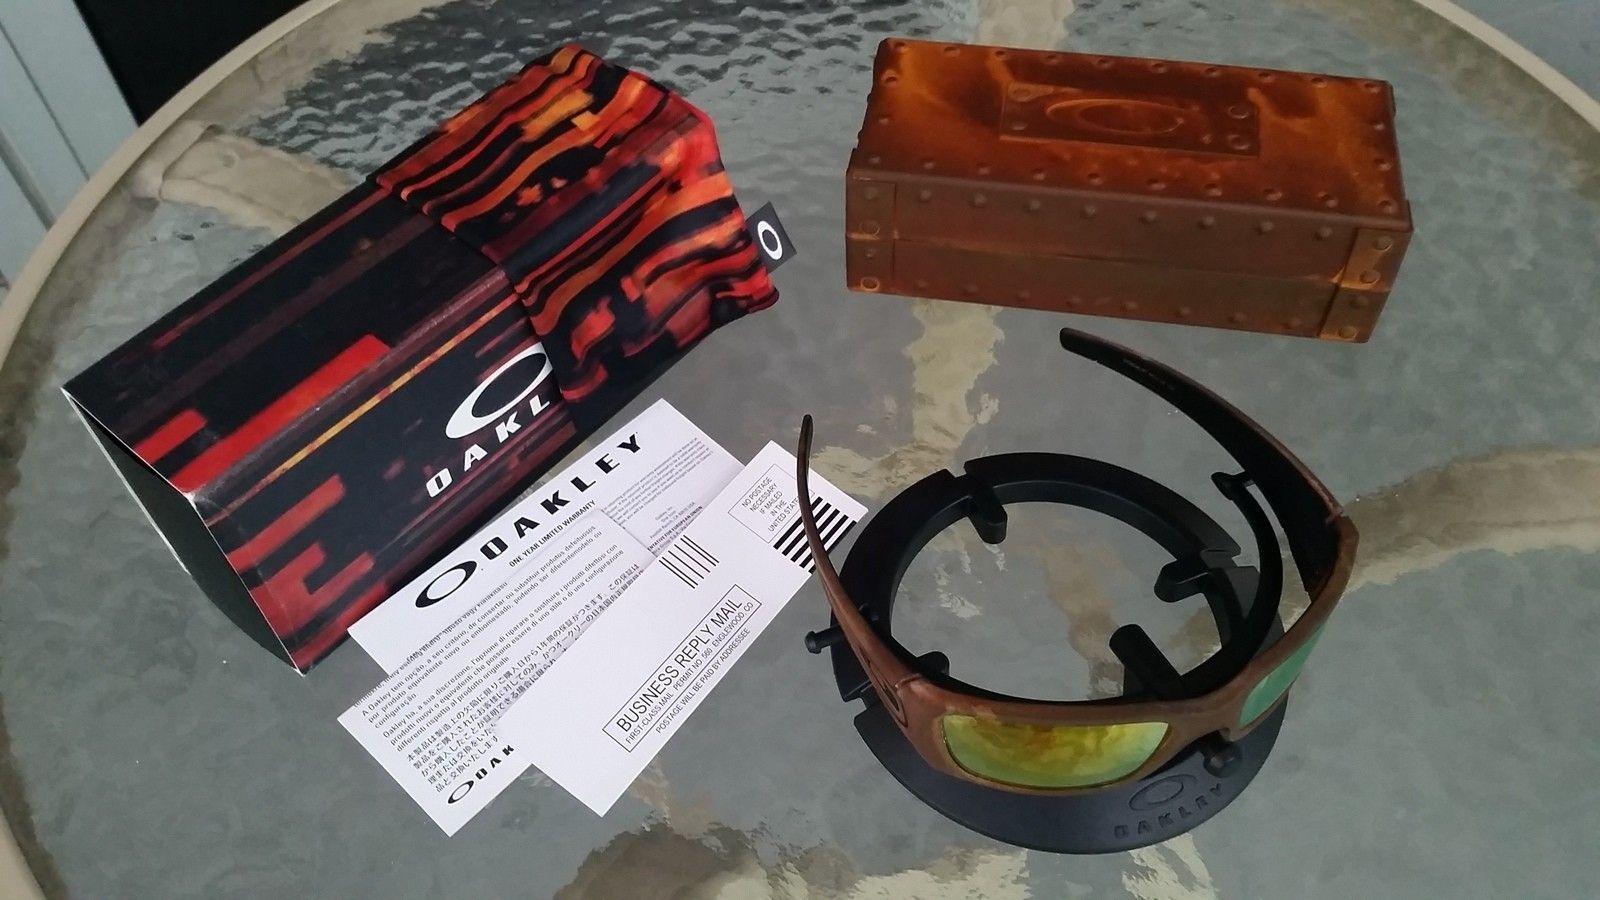 BNIB Fuel Cell Rust Decay -  SOLD - 20151128_172700.jpg